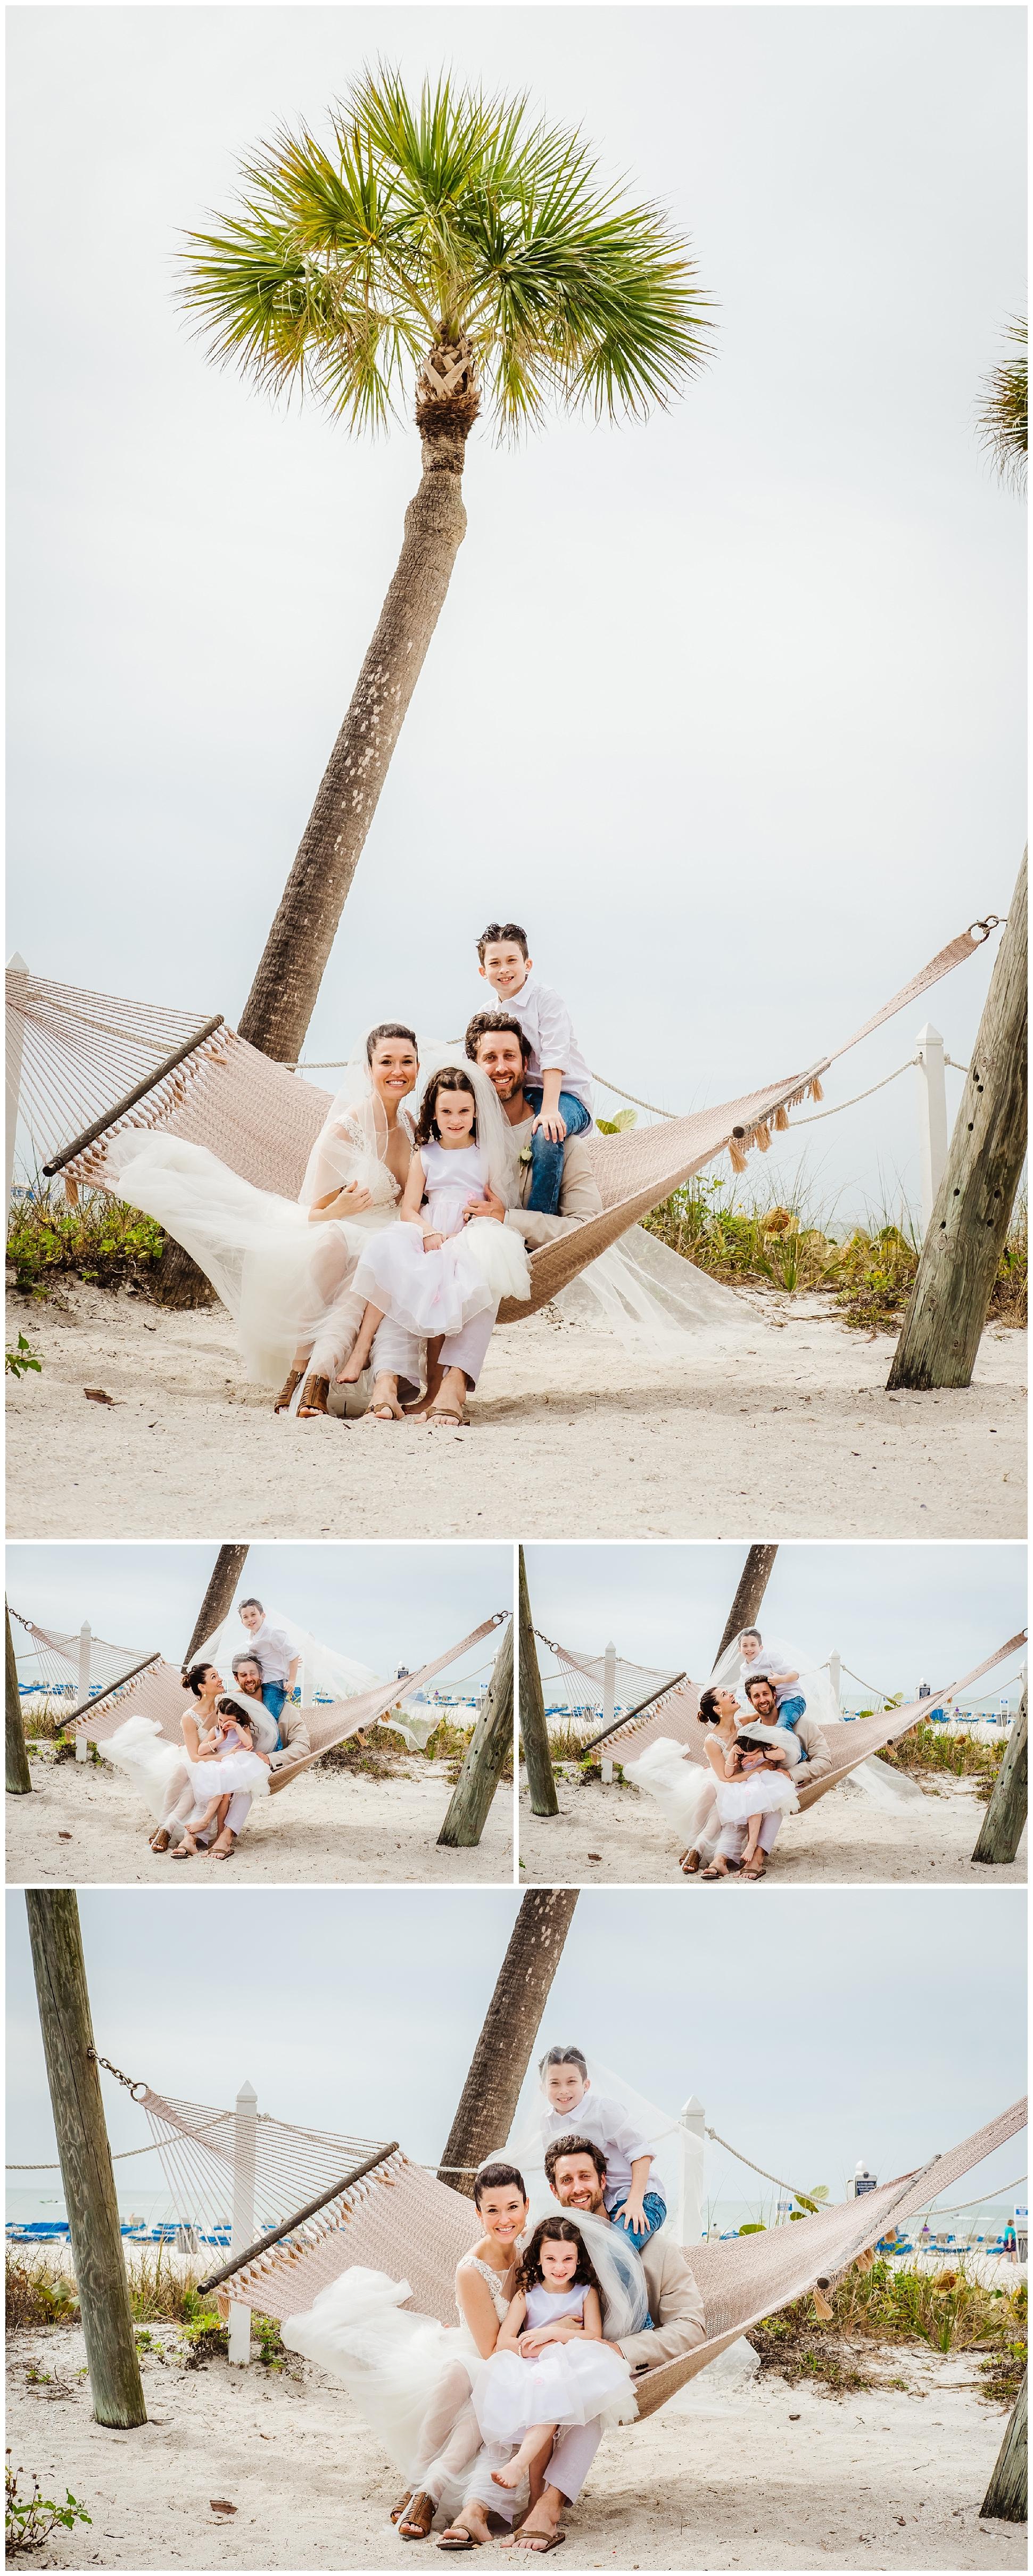 tampa-wedding-photographer-tradewinds-beach-family-elopement_0110.jpg